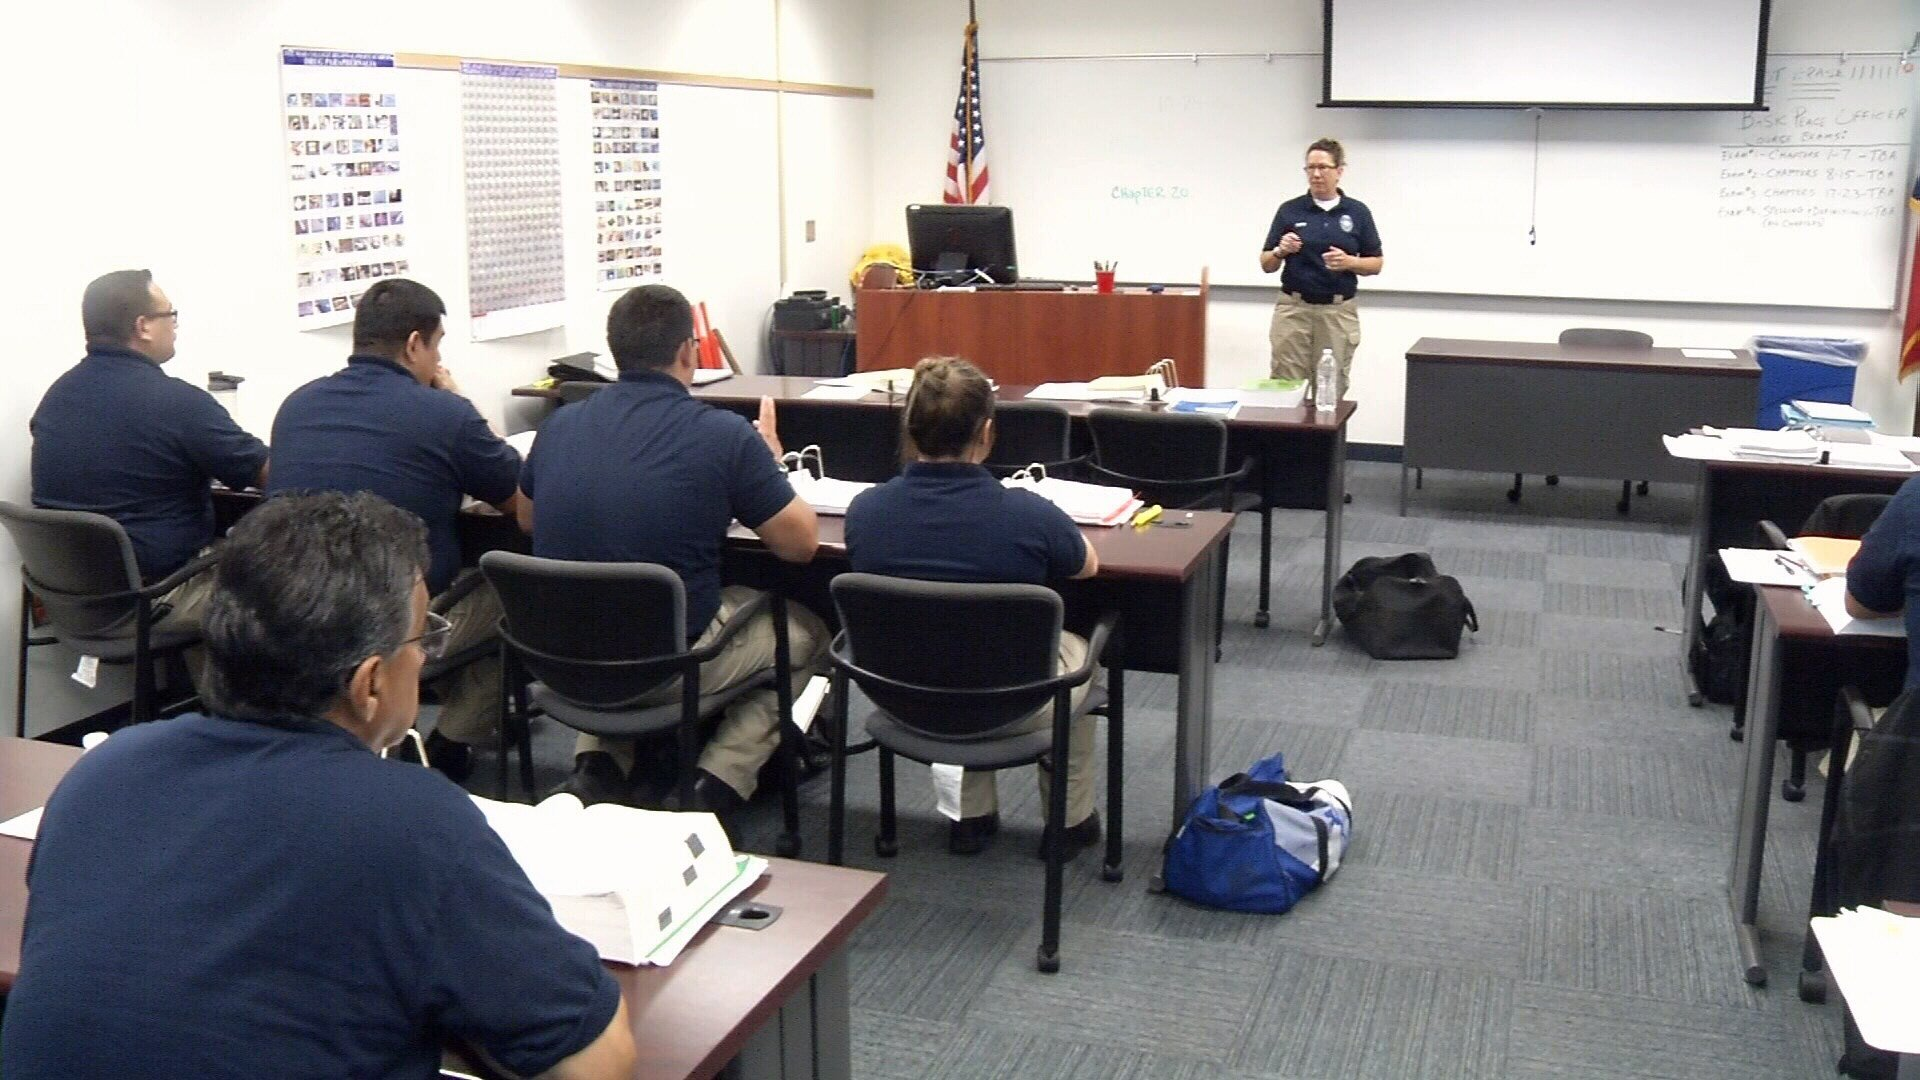 Del mar regional police academy kristv continuous news del mar regional police academy kristv continuous news coverage corpus christi xflitez Gallery